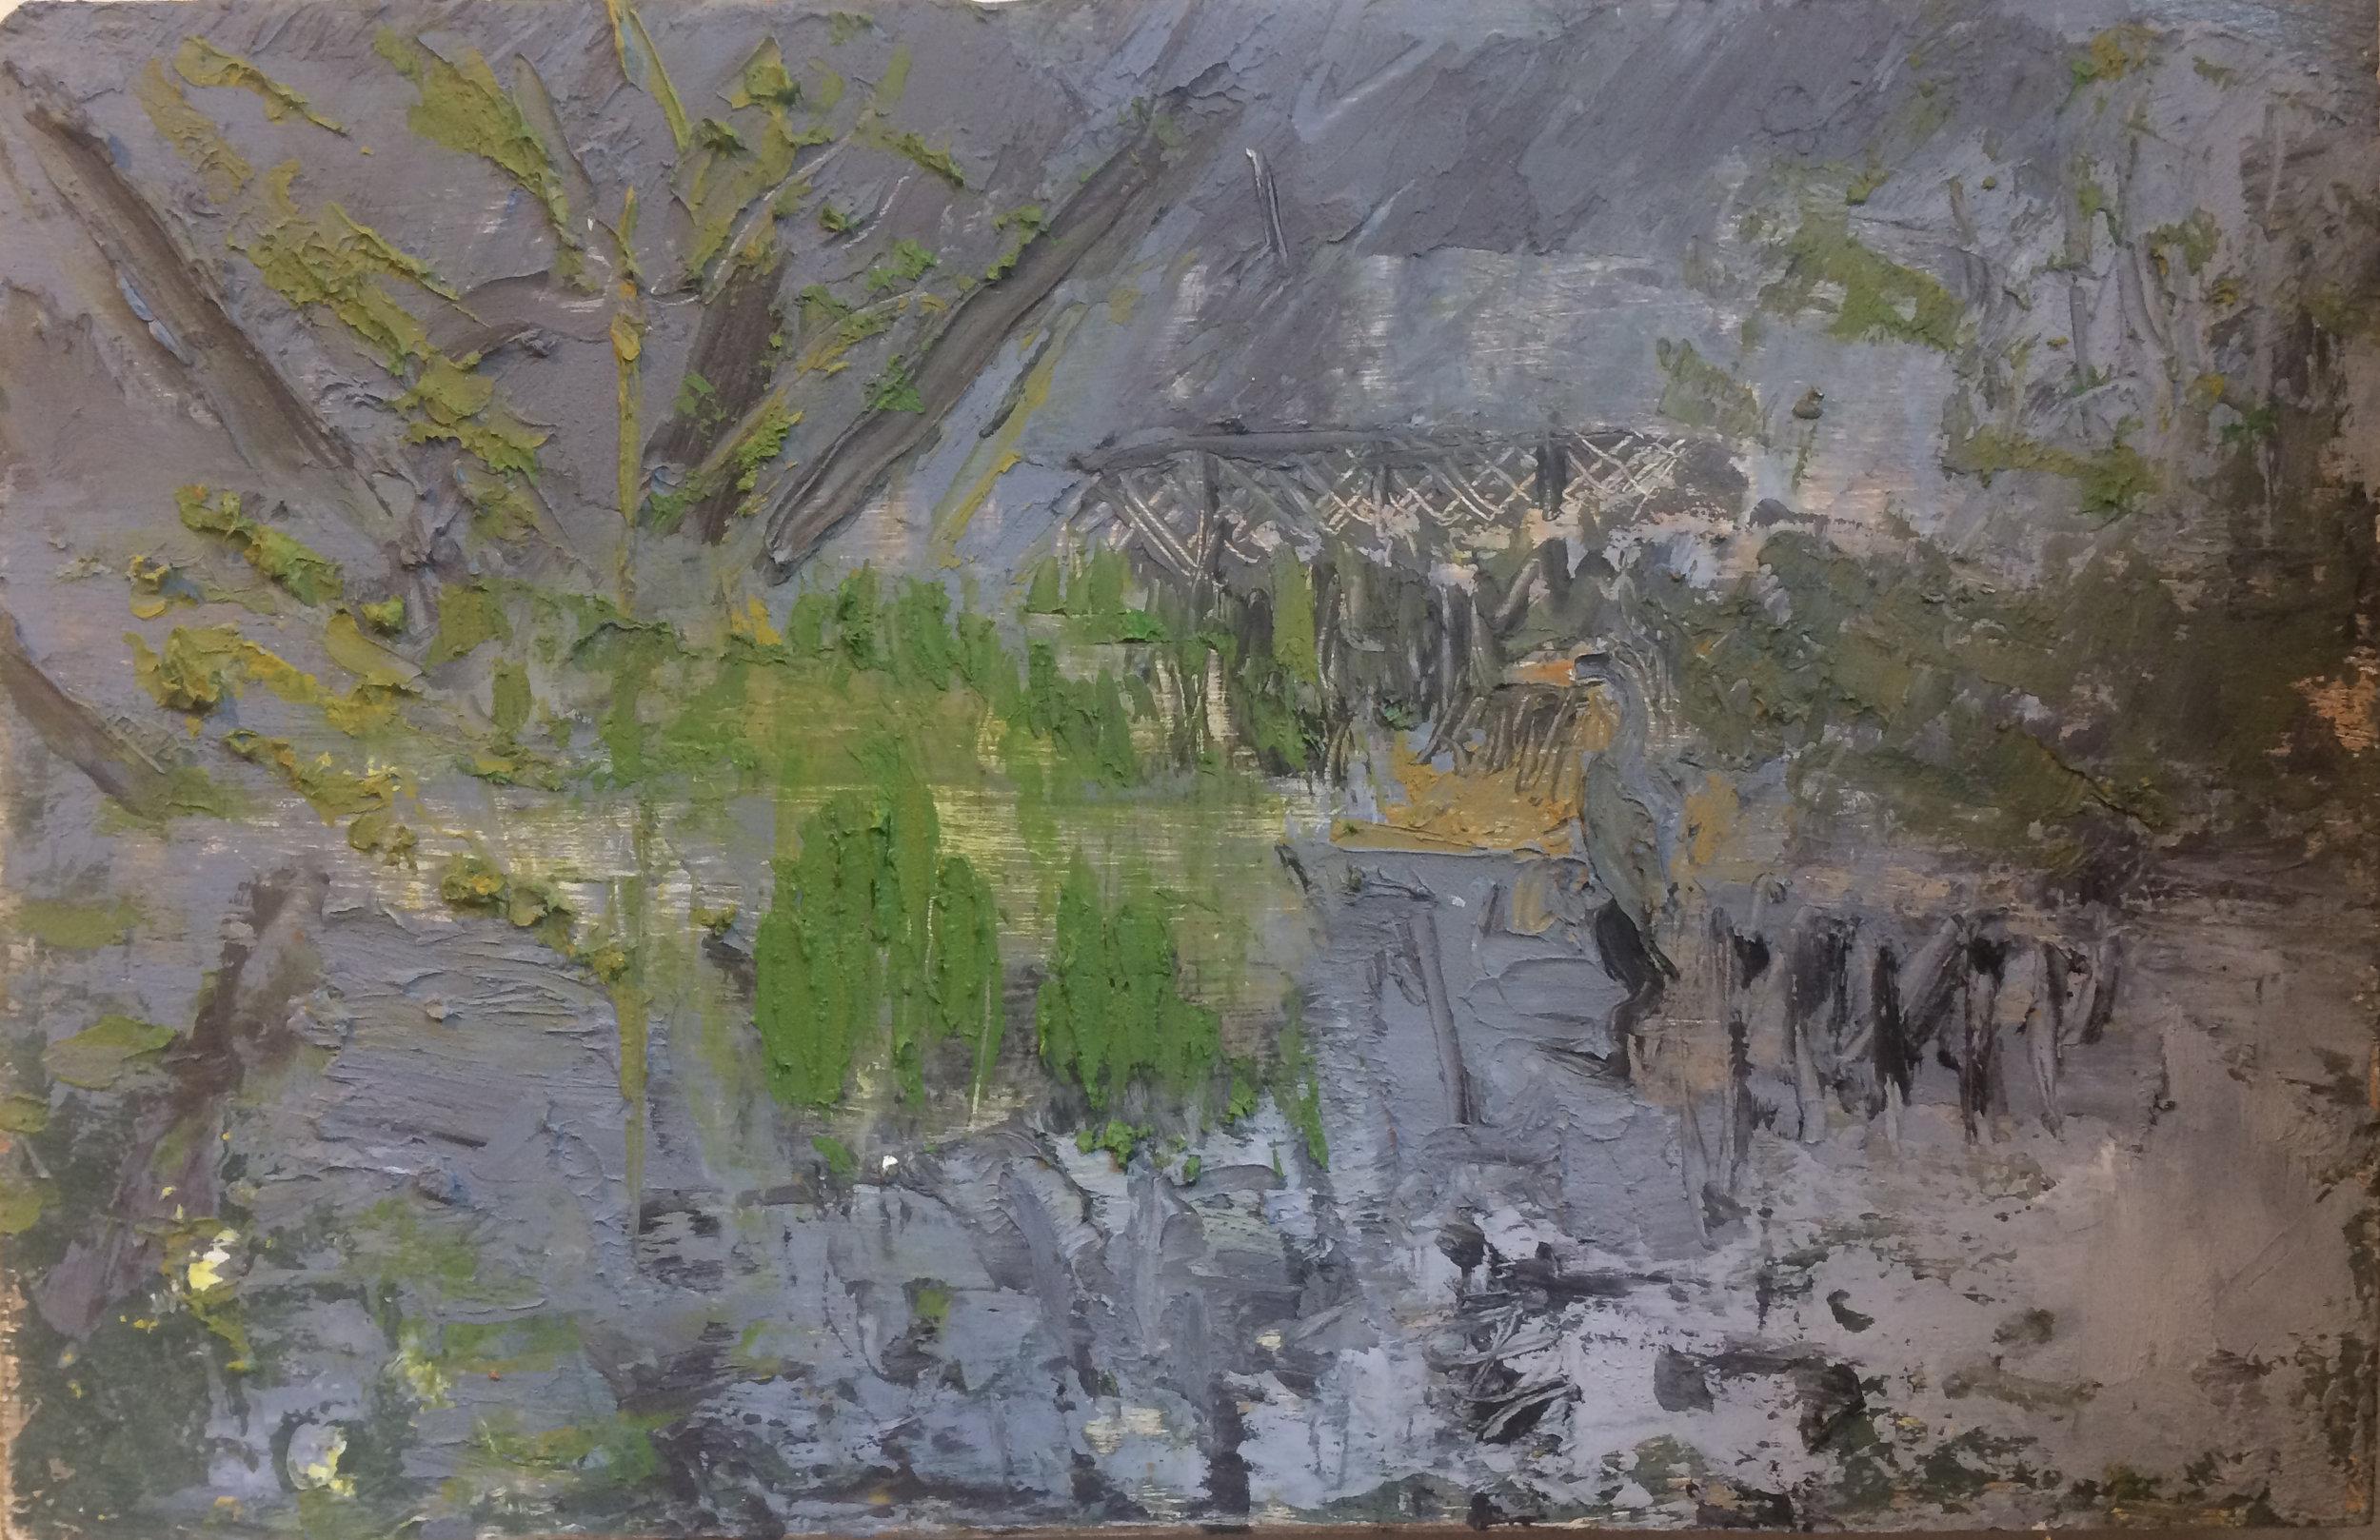 Heron in the marsh (mirror), oil on panel, 2017